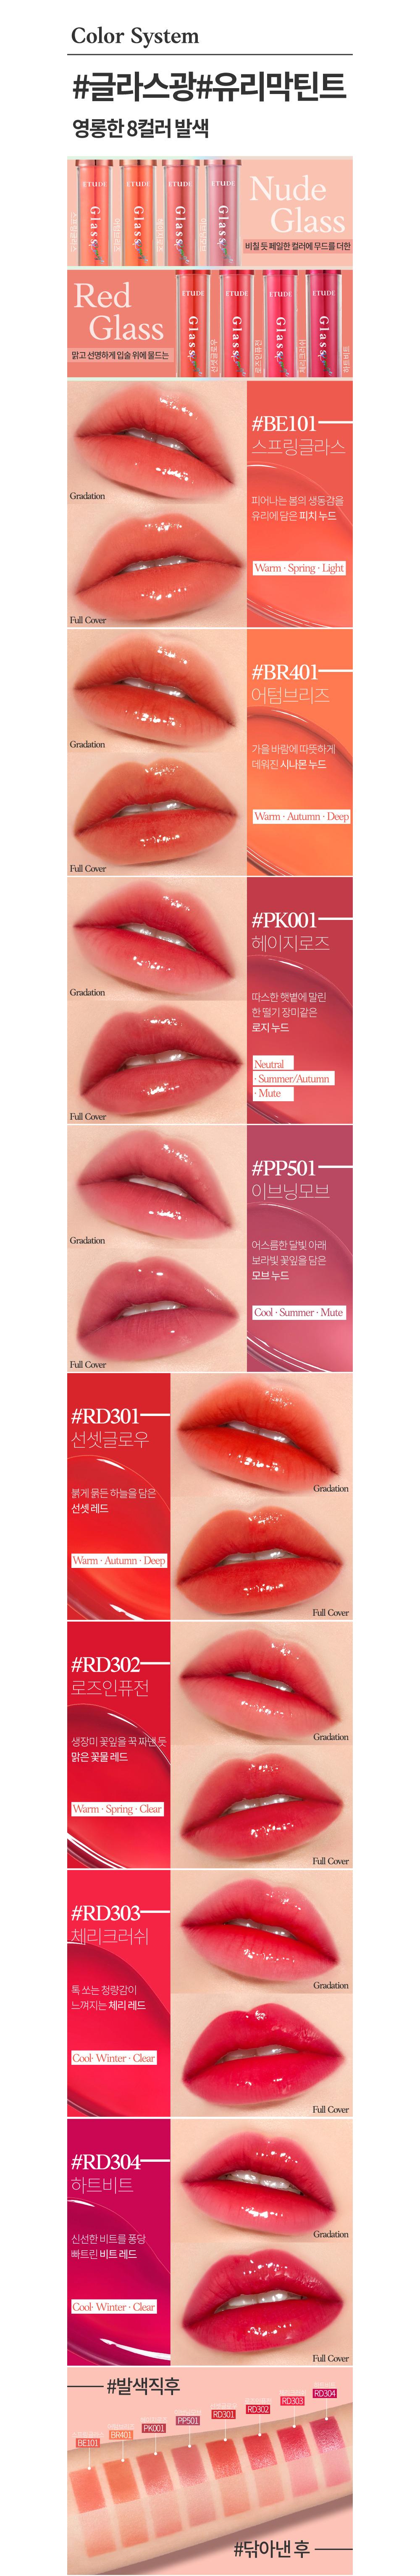 ETUDE HOUSE Glass Rouge Tint 3.2g #Makeup